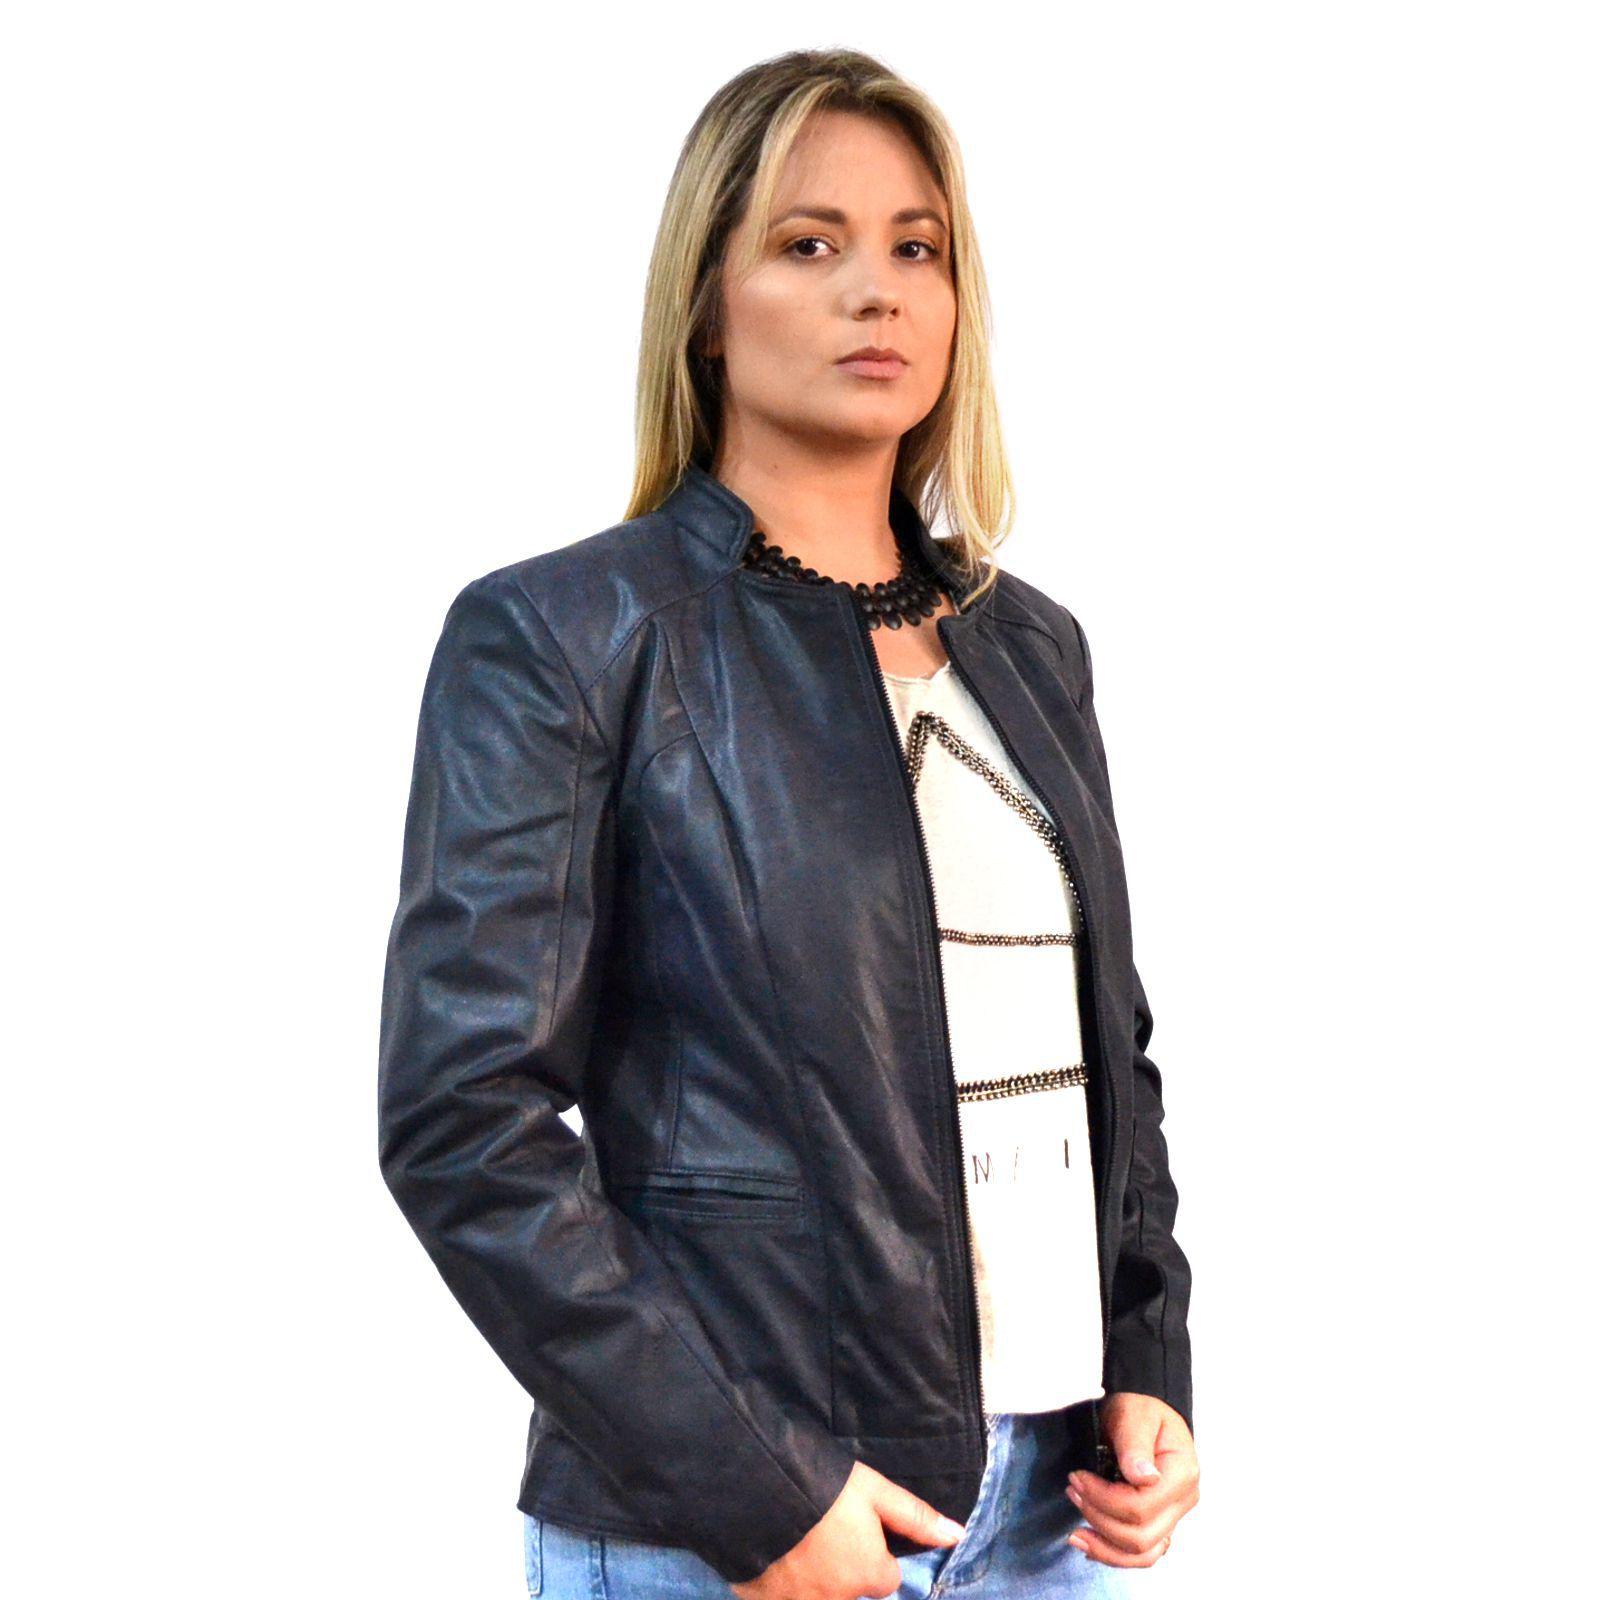 Jaqueta Feminina Prata Couro 215 Ranger Marinho